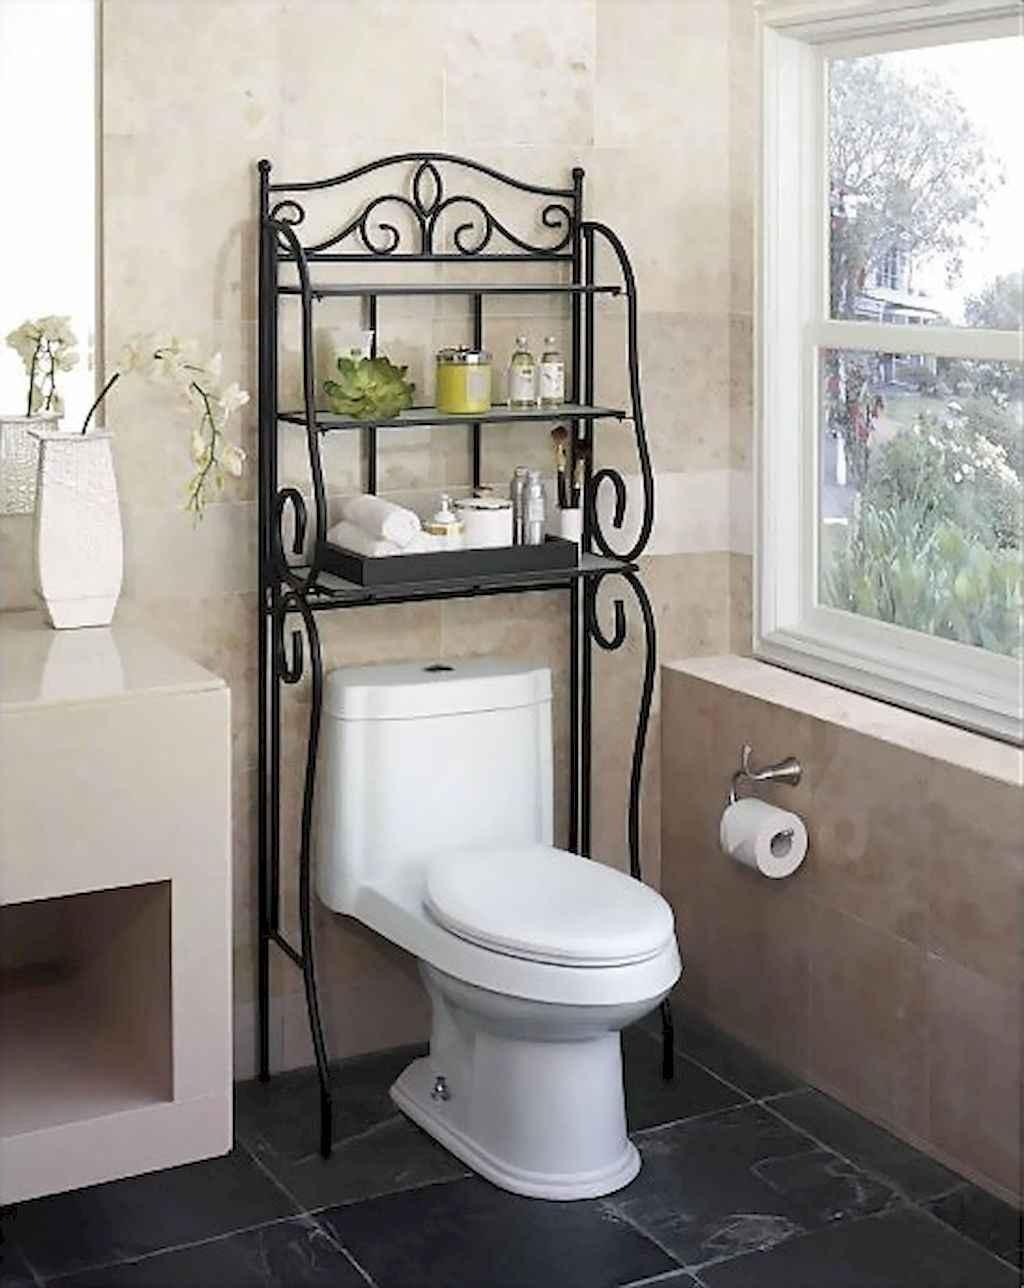 Cool bathroom storage shelves organization ideas (63)